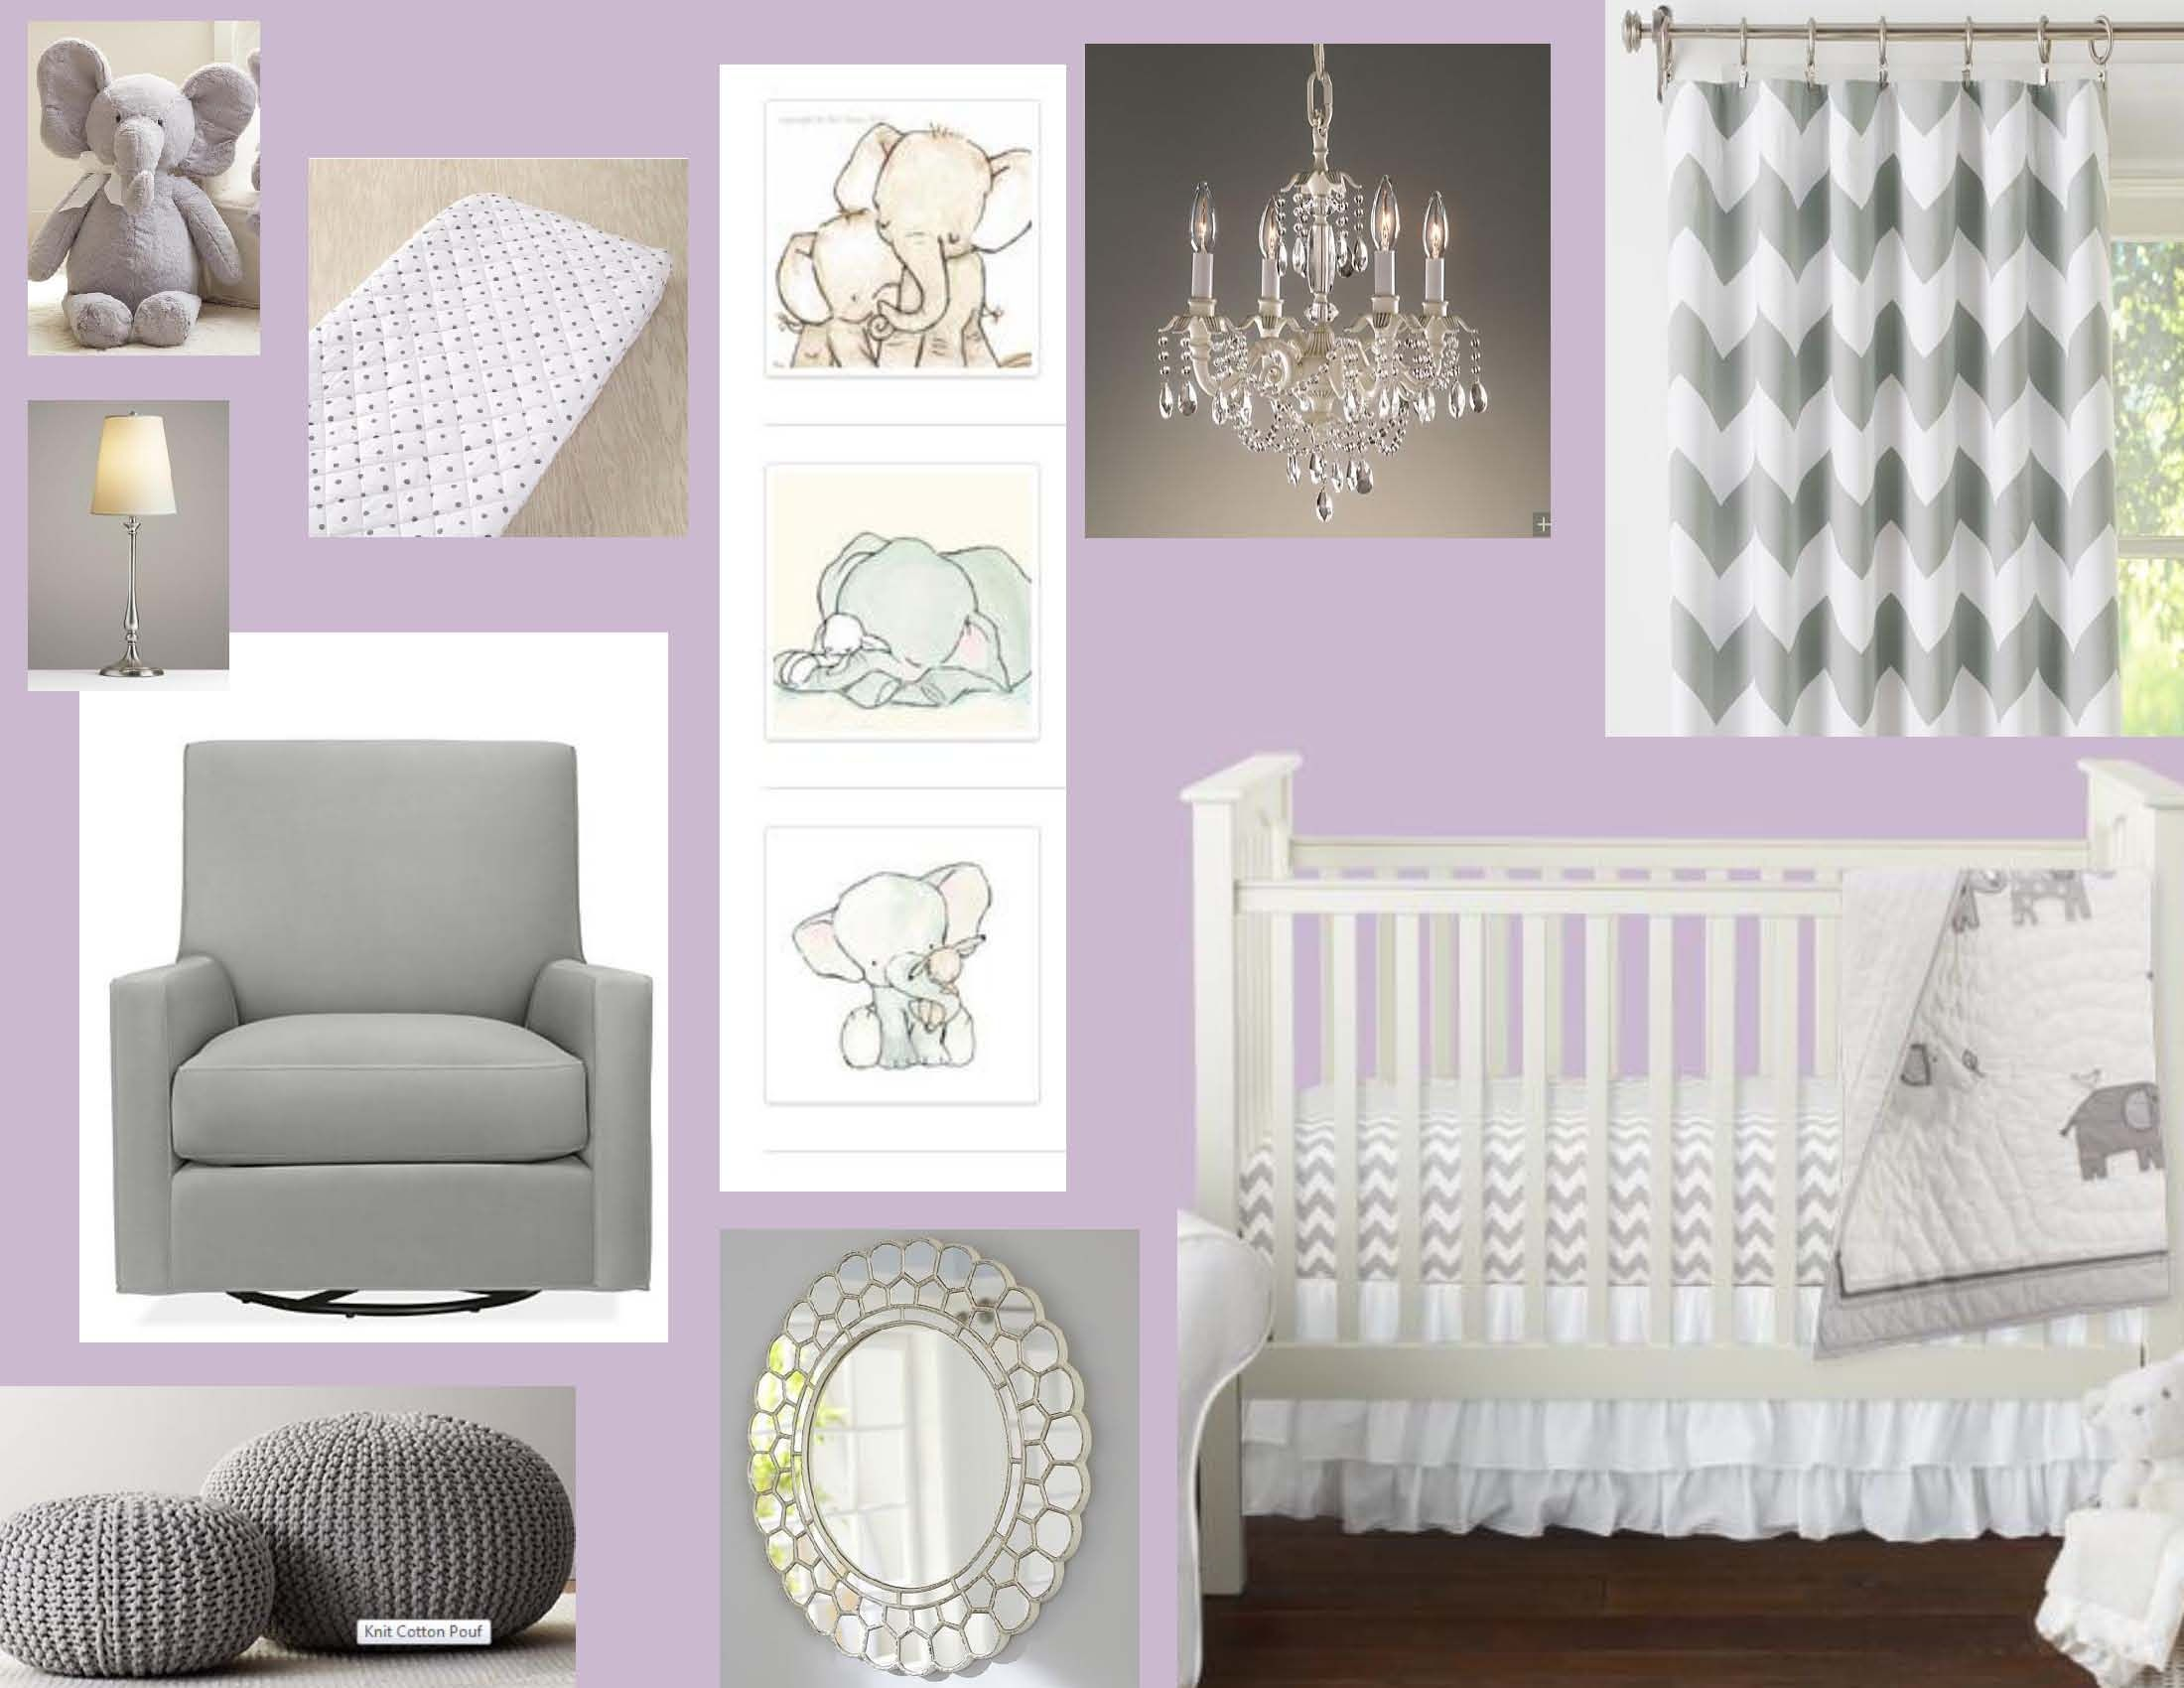 purple and grey elephant nursery design board baby pinterest grey elephant nursery. Black Bedroom Furniture Sets. Home Design Ideas